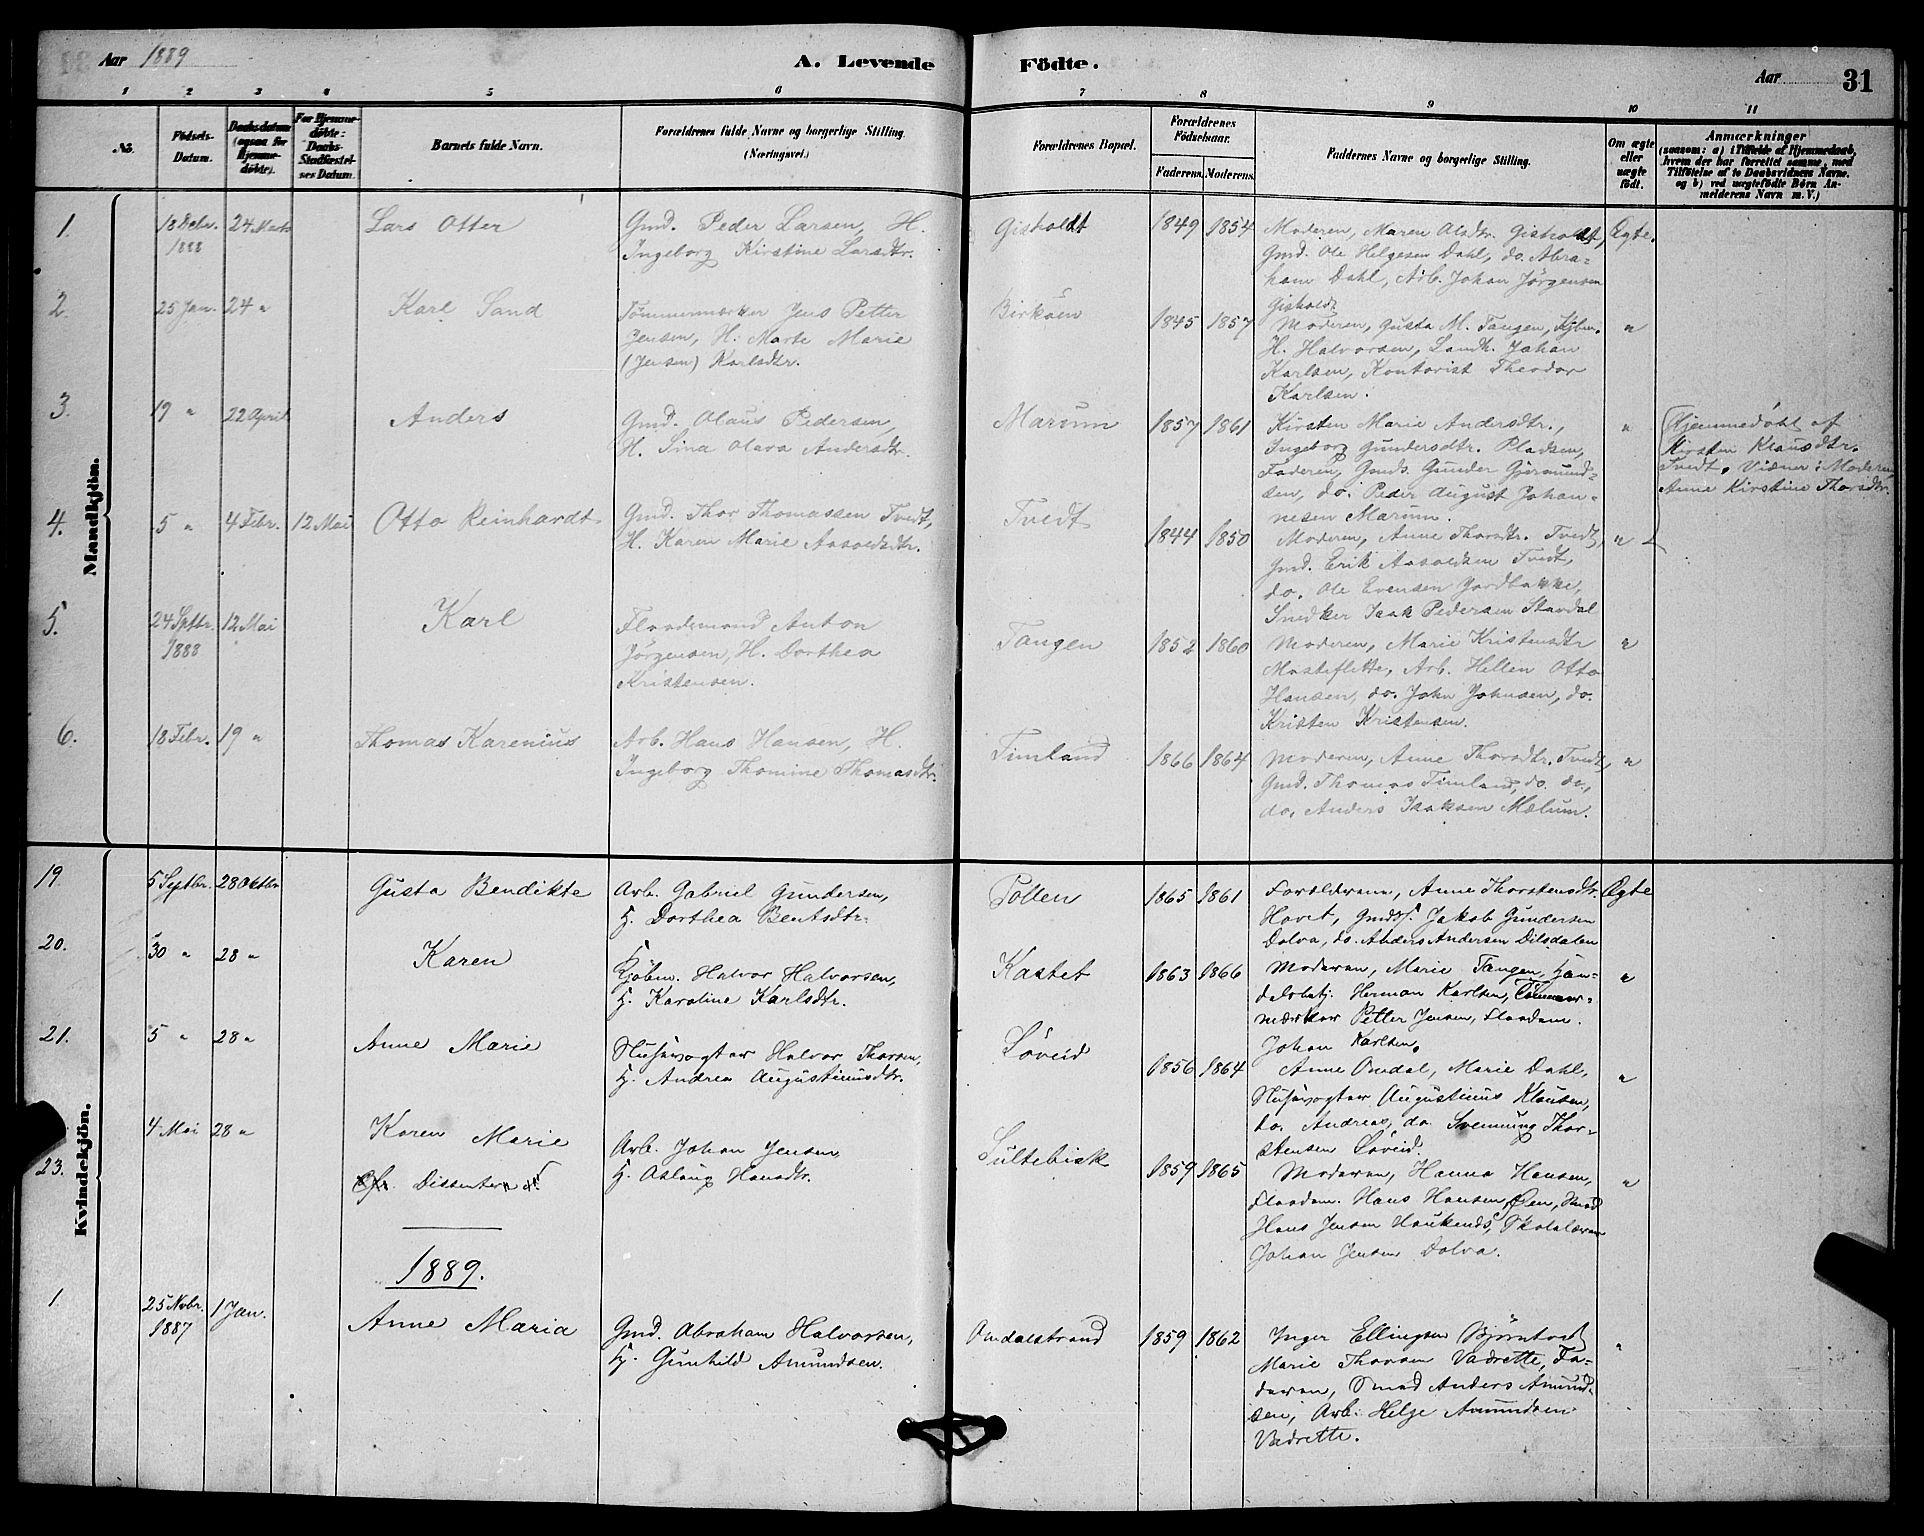 SAKO, Solum kirkebøker, G/Gb/L0003: Klokkerbok nr. II 3, 1880-1898, s. 31